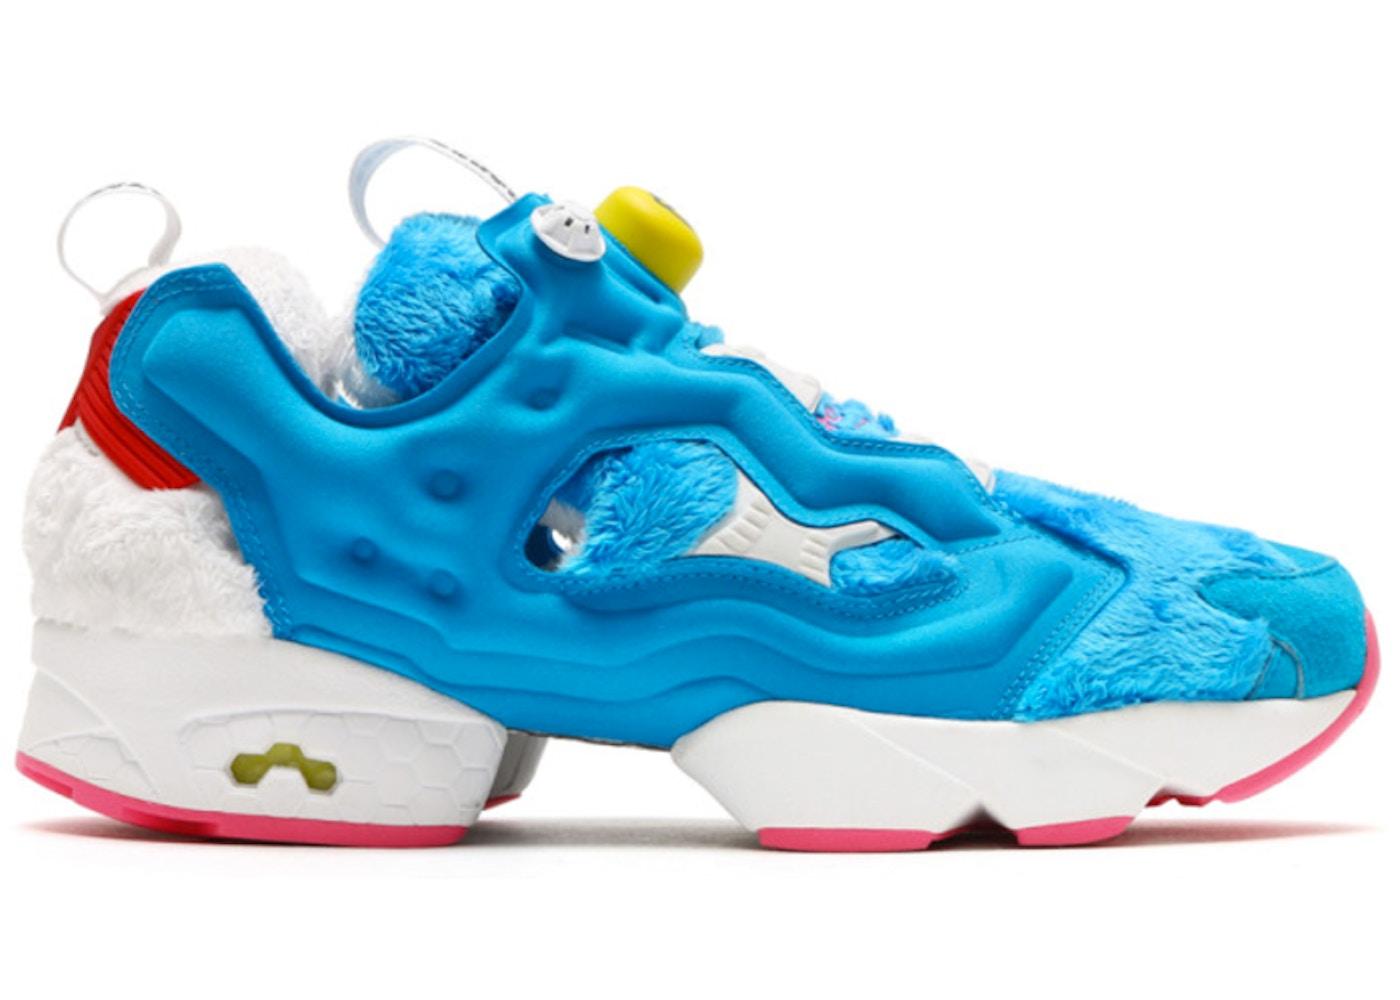 Shoes X Doraemon Instapump Atmos Reebok Fury Packer n0OXwN8Pk